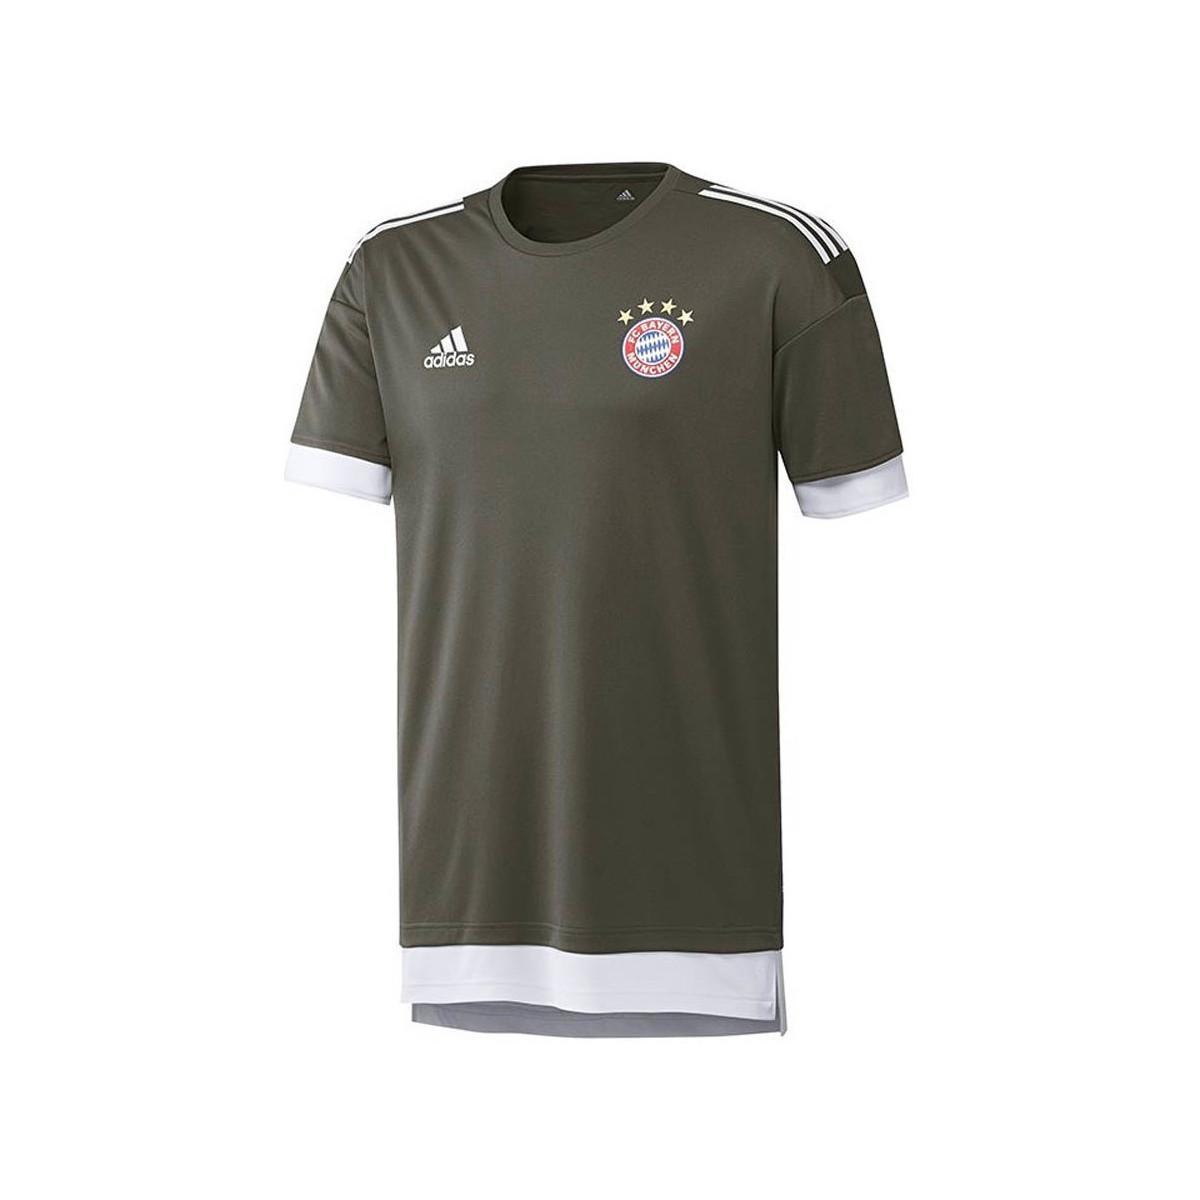 783c23ceb87e Adidas 2017-2018 Bayern Munich Ucl Training Shirt (cinder) Men's T ...